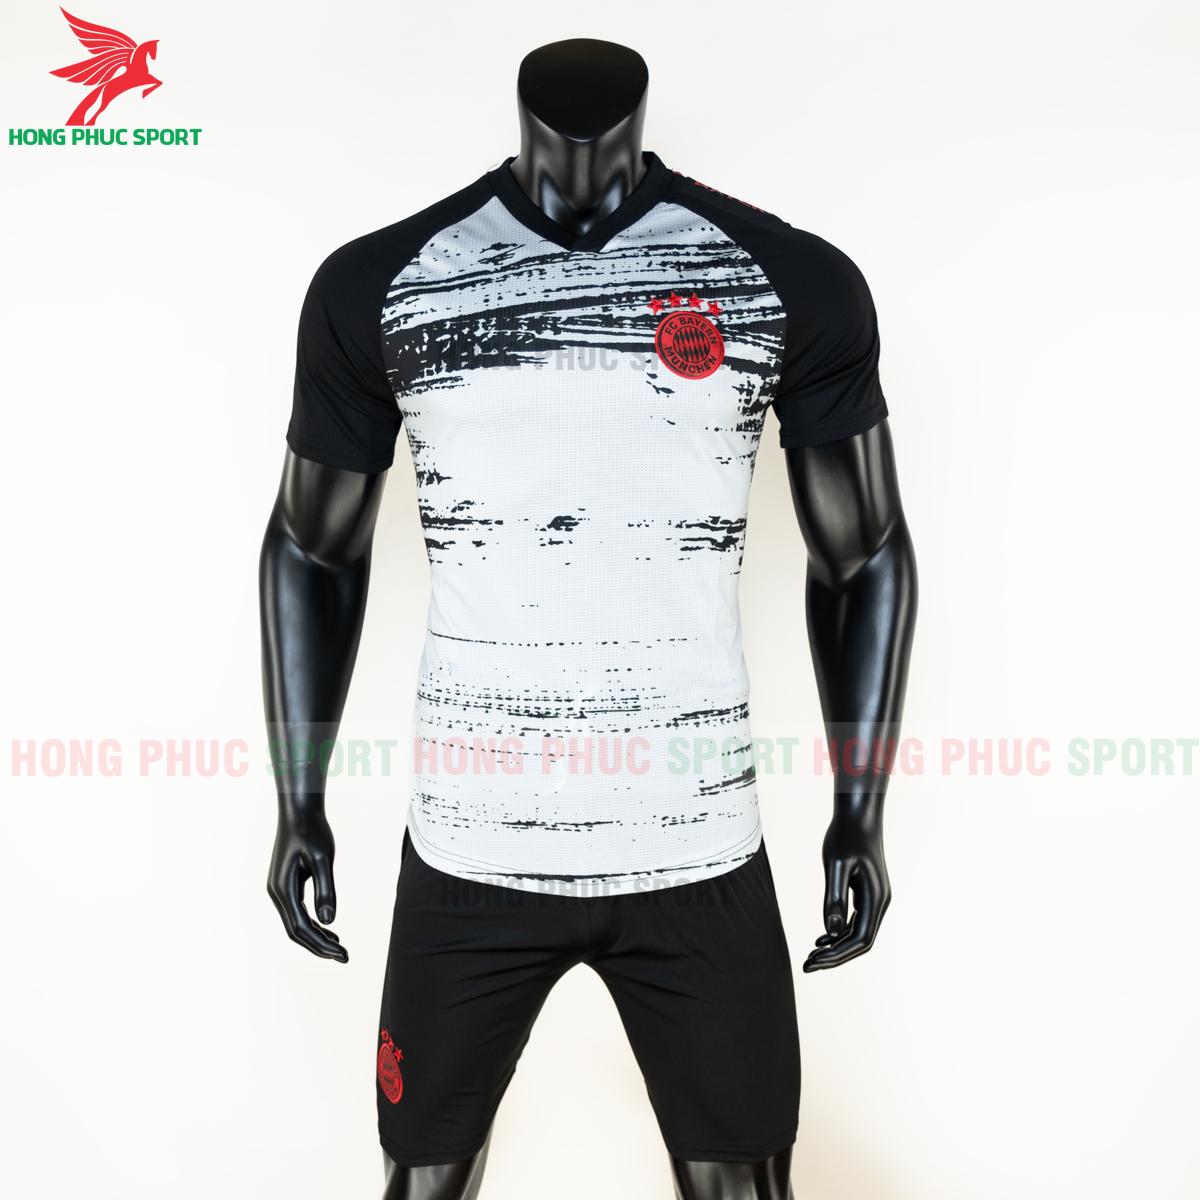 https://cdn.hongphucsport.com/unsafe/s4.shopbay.vn/files/285/ao-bong-da-bayern-munich-2020-2021-pre-match-hang-thailand-2-5f8febf15f224.png